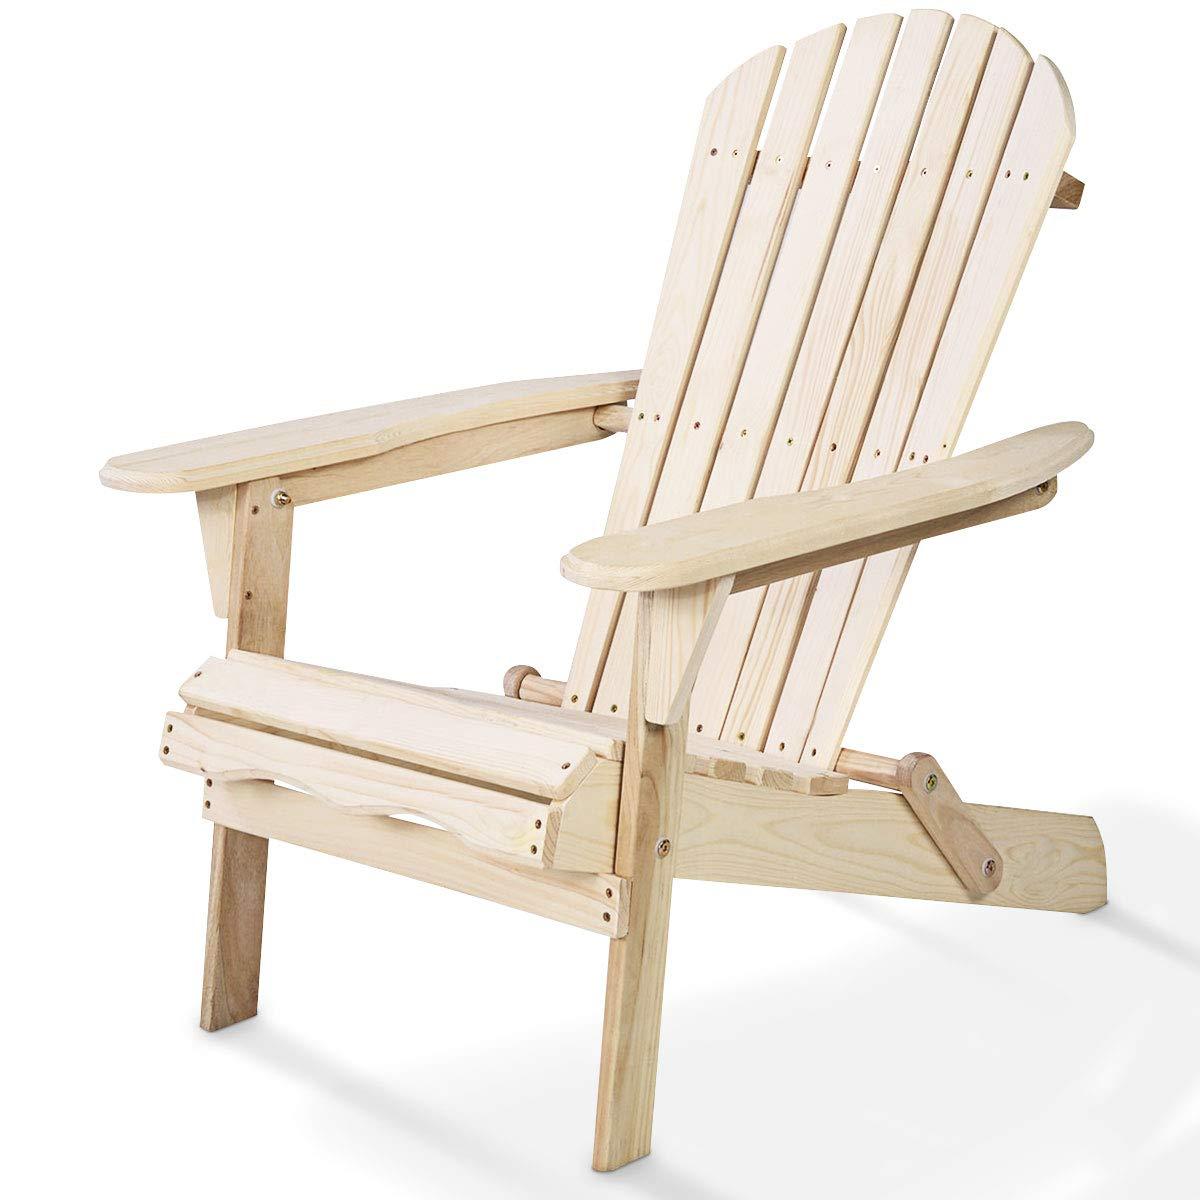 Remarkable Giantex Adirondack Chair Foldable Outdoor Fir Construction For Patio Garden Deck Furniture Wood Gamerscity Chair Design For Home Gamerscityorg